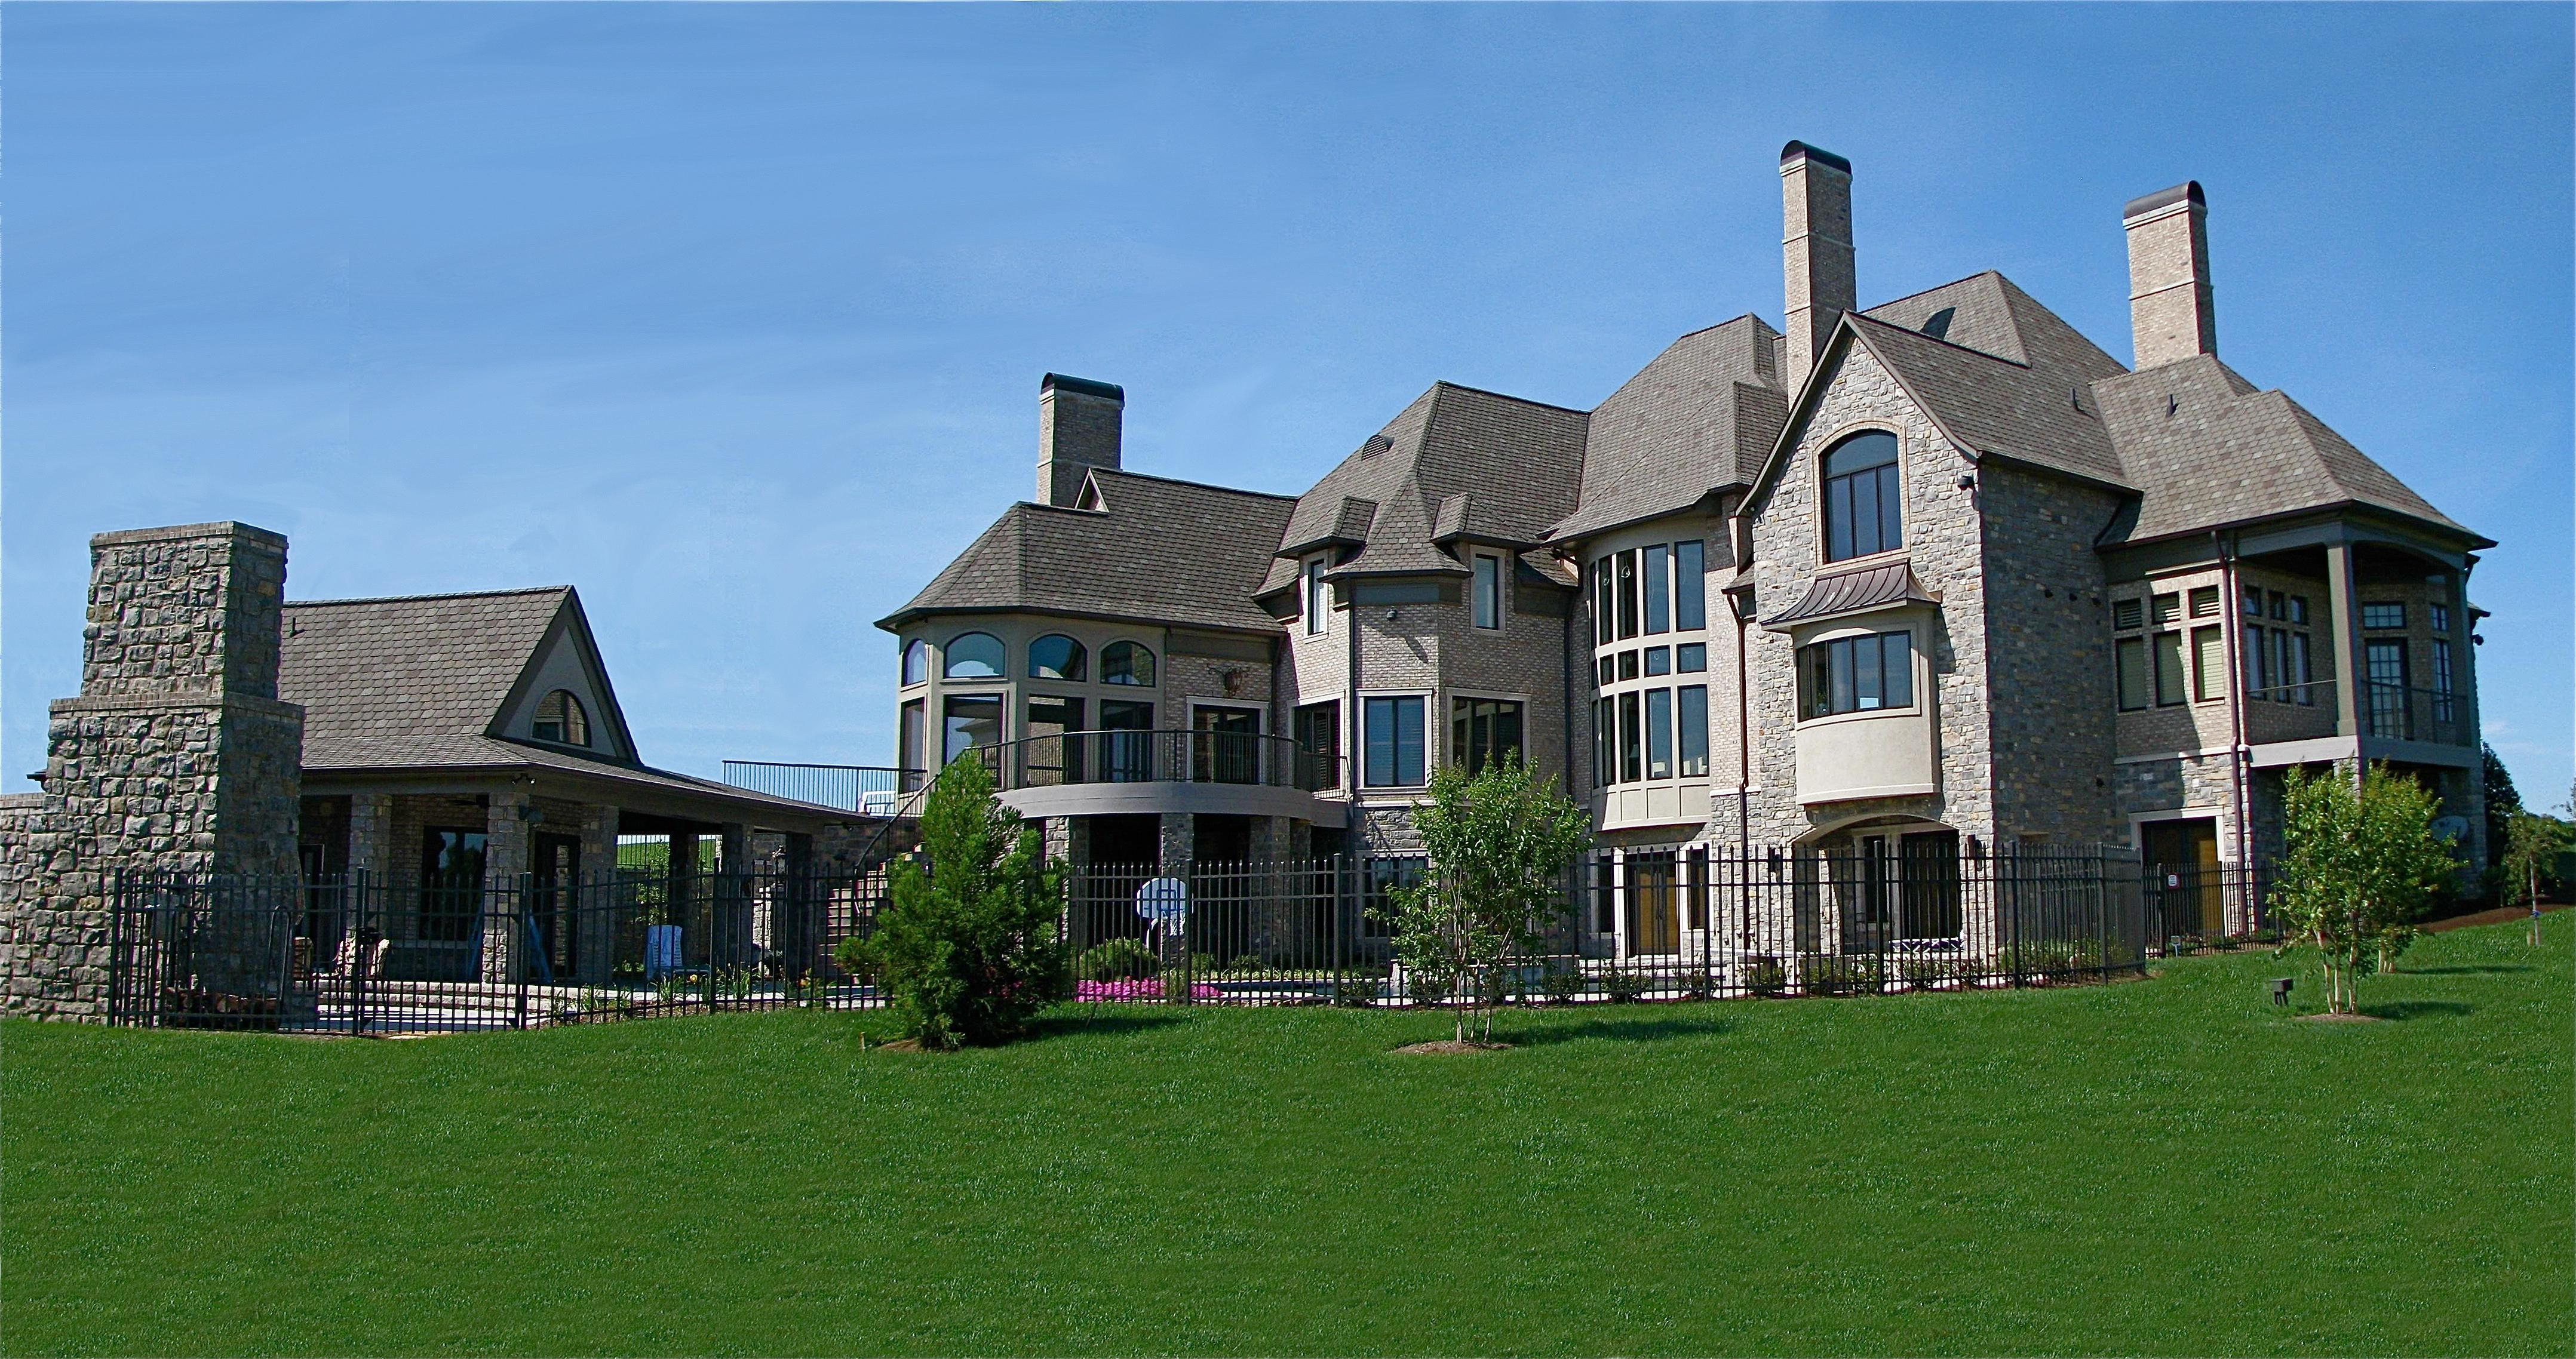 Stone Crest Manor | Stephen Davis Home Design